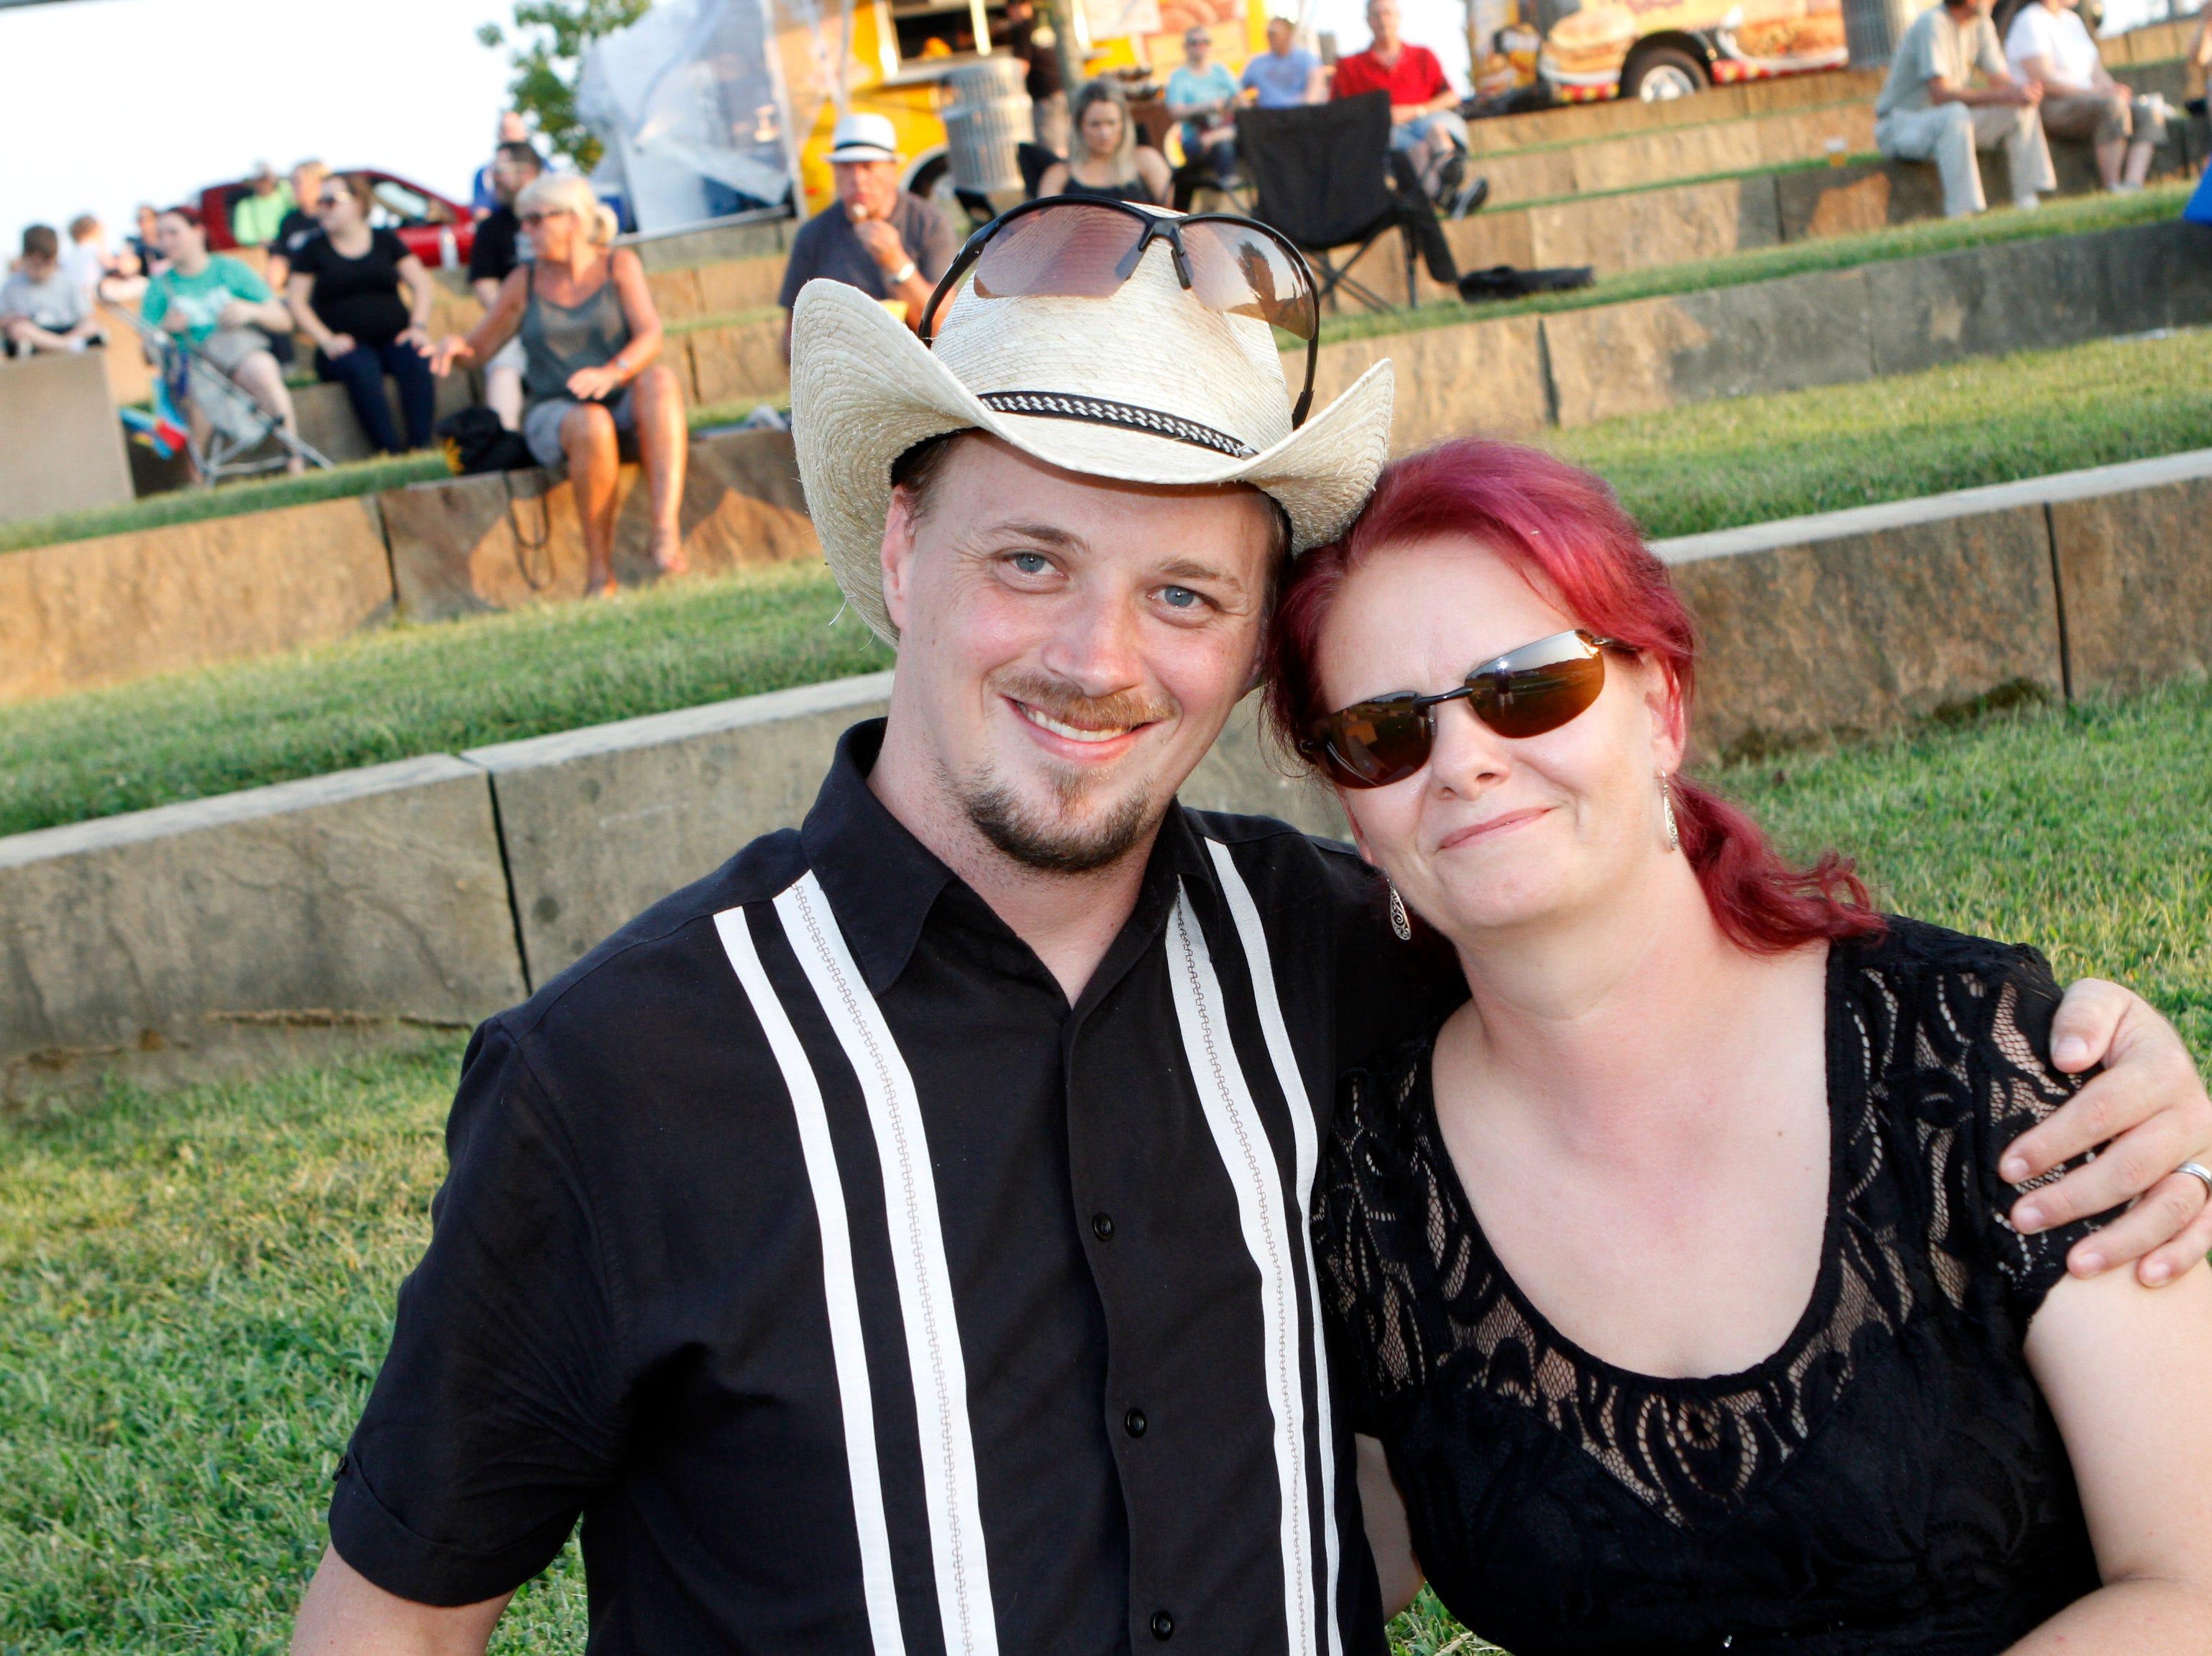 Jonathan Hyatt and Carmen Cavazos at Saturday's Road to Riverfest, a Liberty Park summer concert series event.